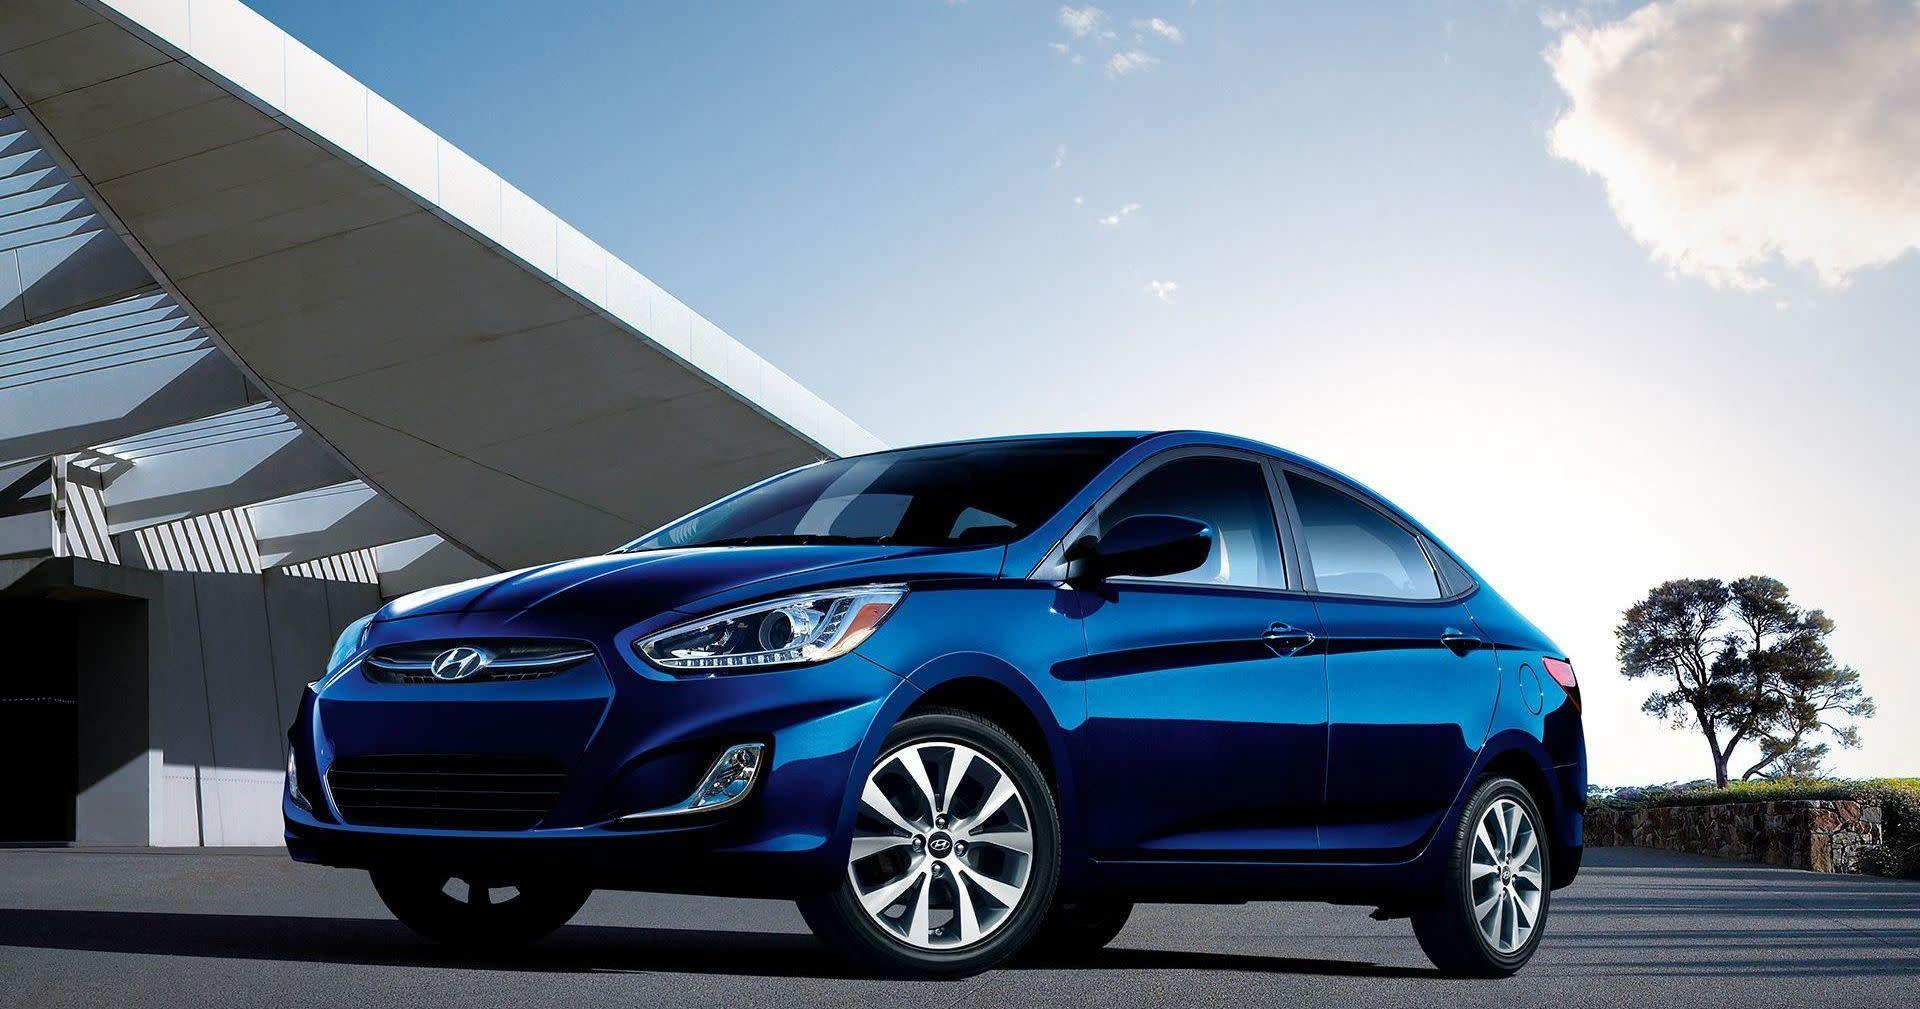 Used Hyundai Accent for Sale near Alexandria, VA